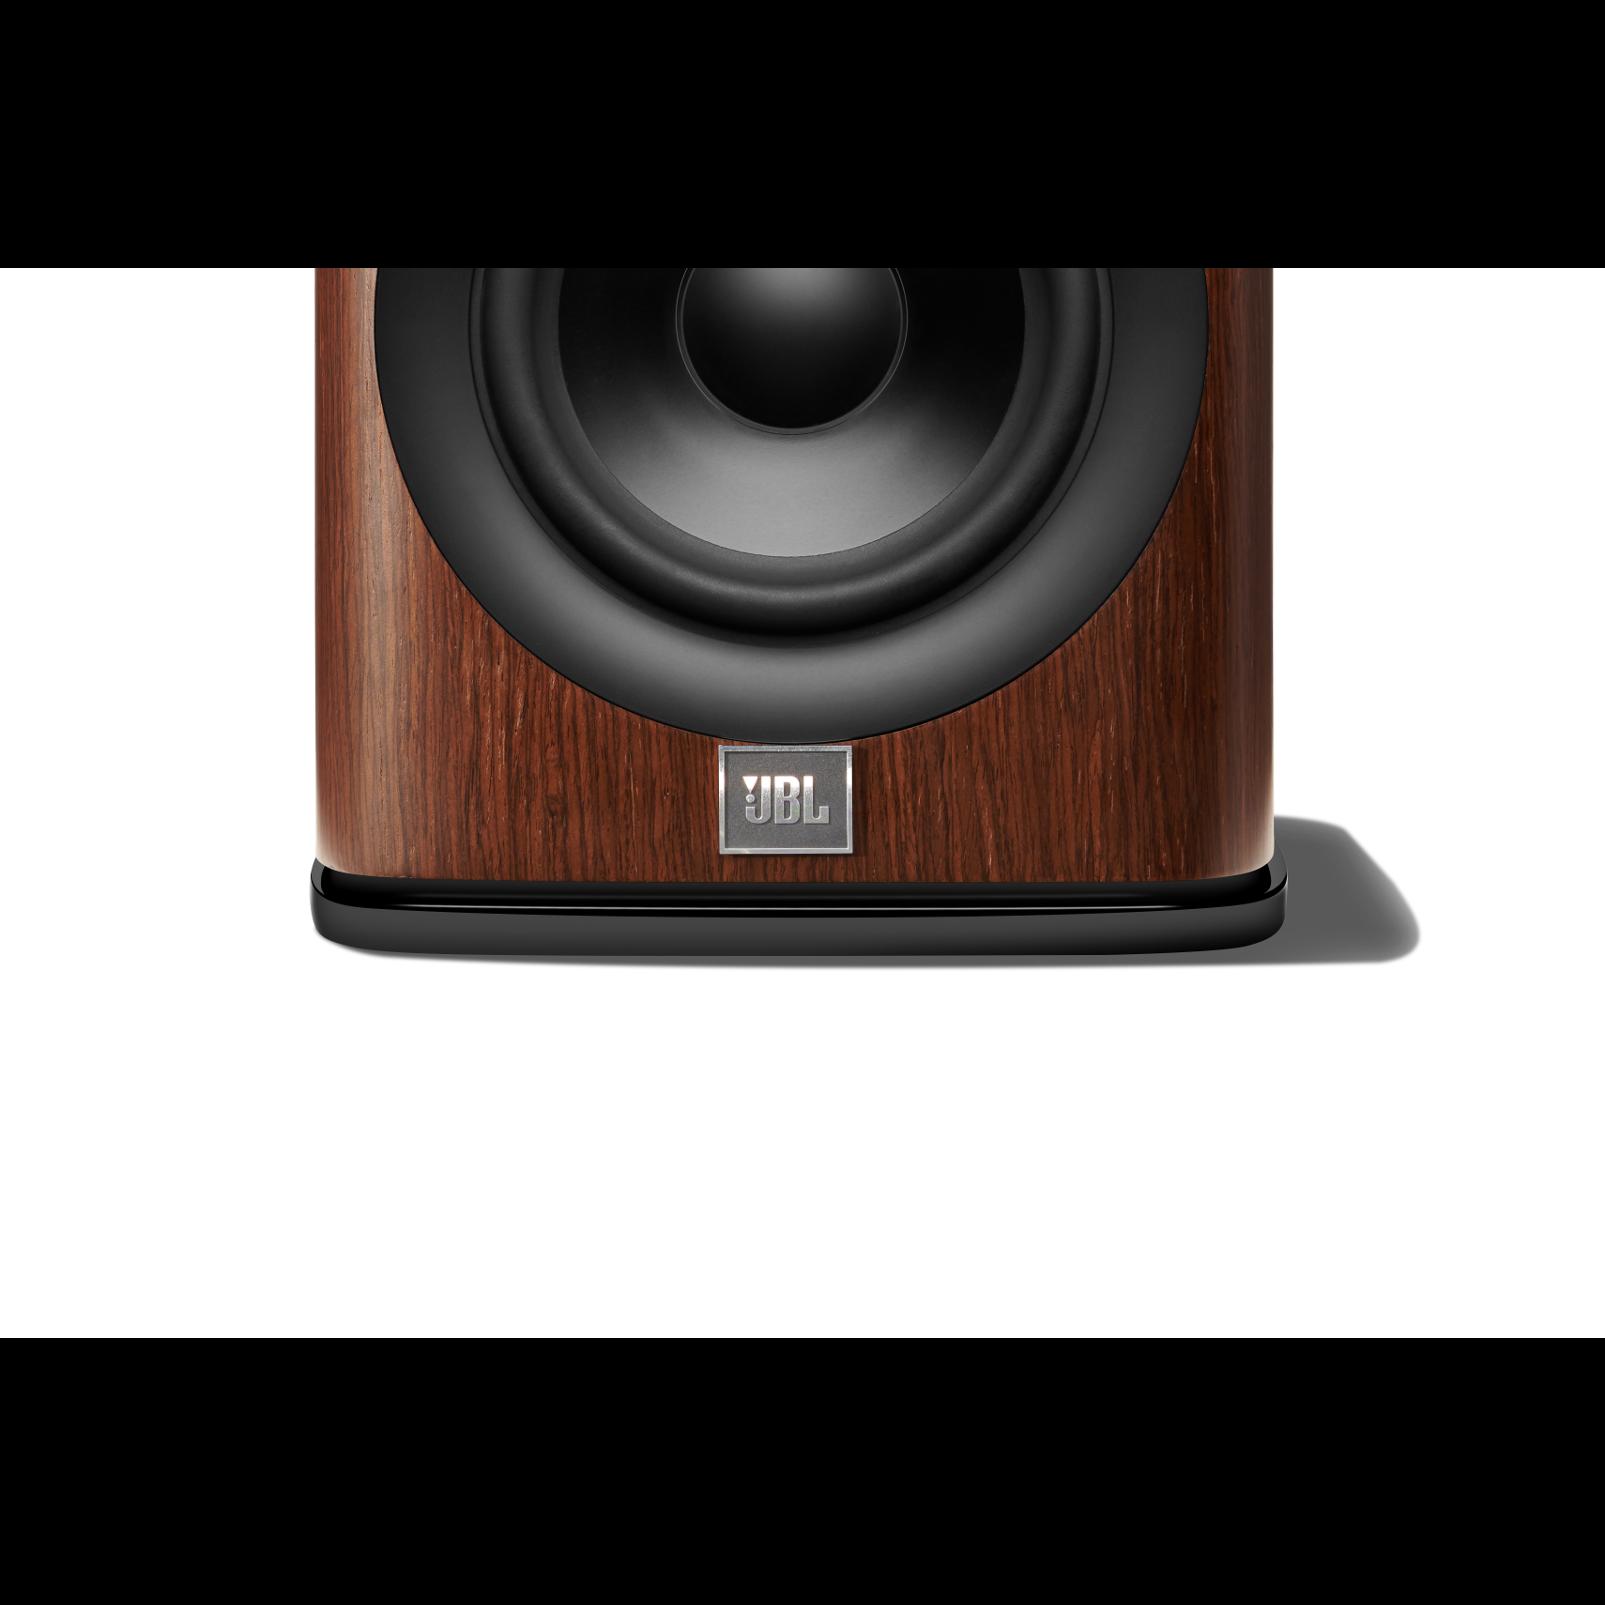 HDI-1600 - Walnut - 2-way 6.5-inch (165mm) Bookshelf Loudspeaker - Detailshot 2